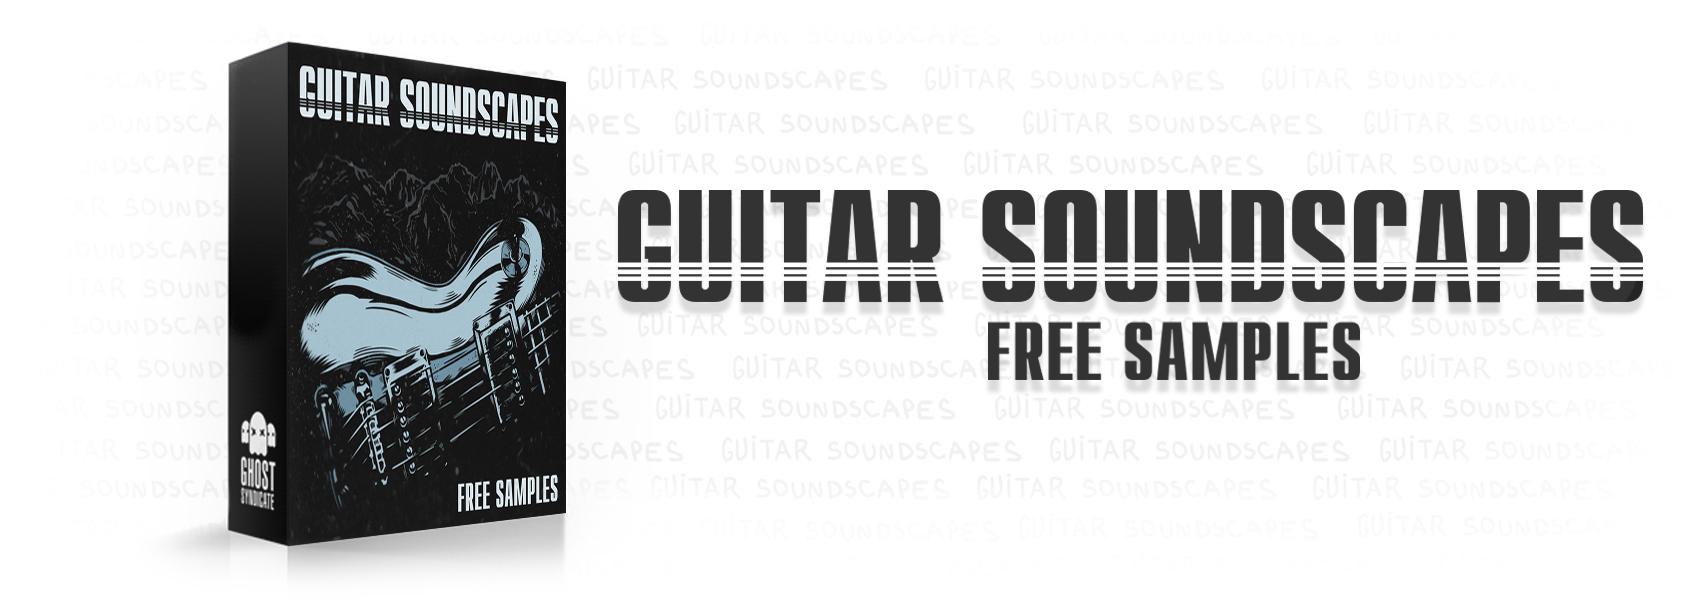 Guitar Soundscapes, Free Samples, Free Sample Pack, Funk, Jazz, Ghost Syndicate, Sample Pack, Samples, 24bit WAV